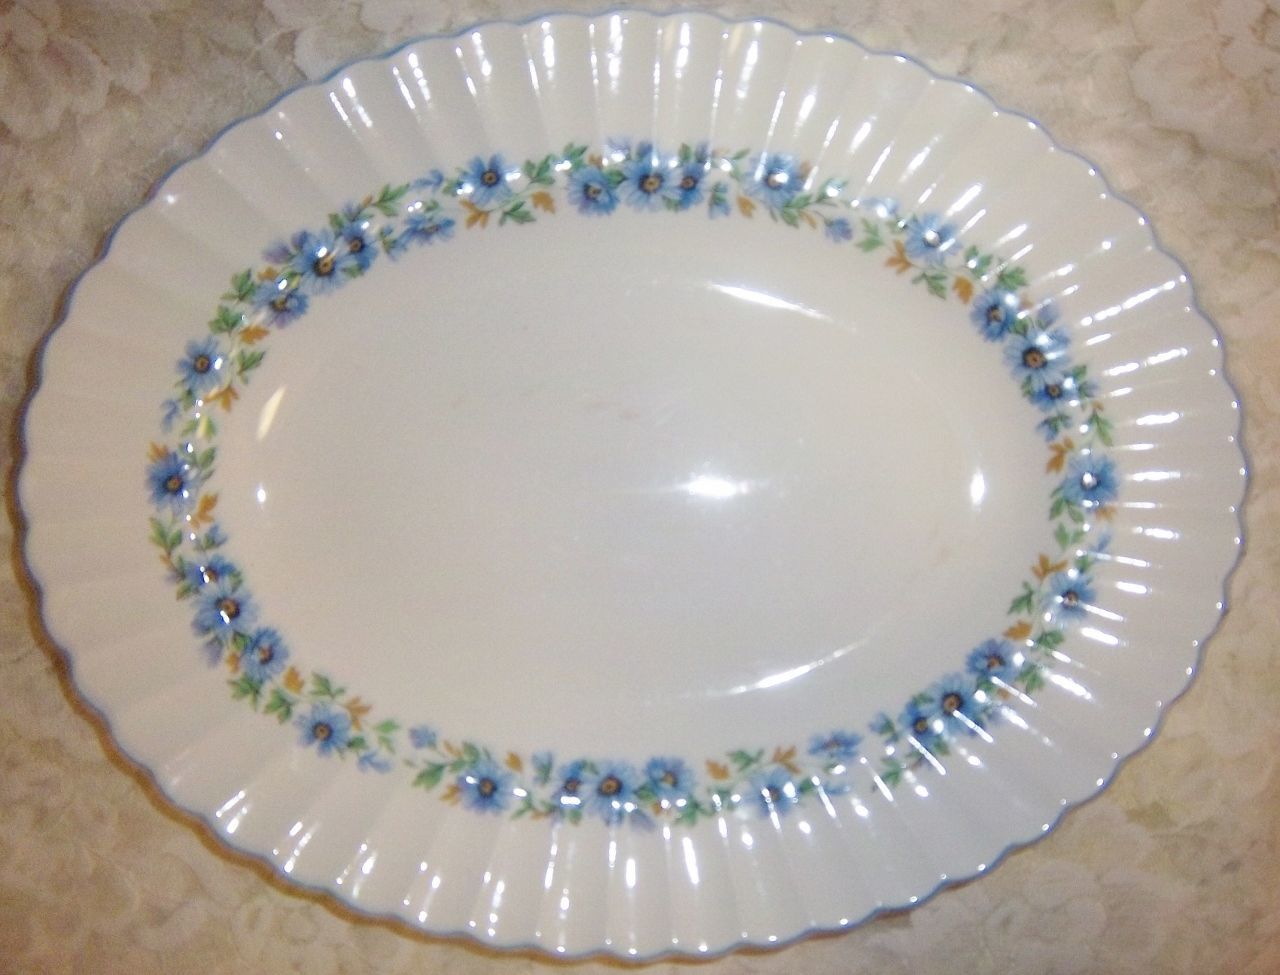 Thanksgiving-Christmas Alpine Mist Platter Meakin  - $12.99